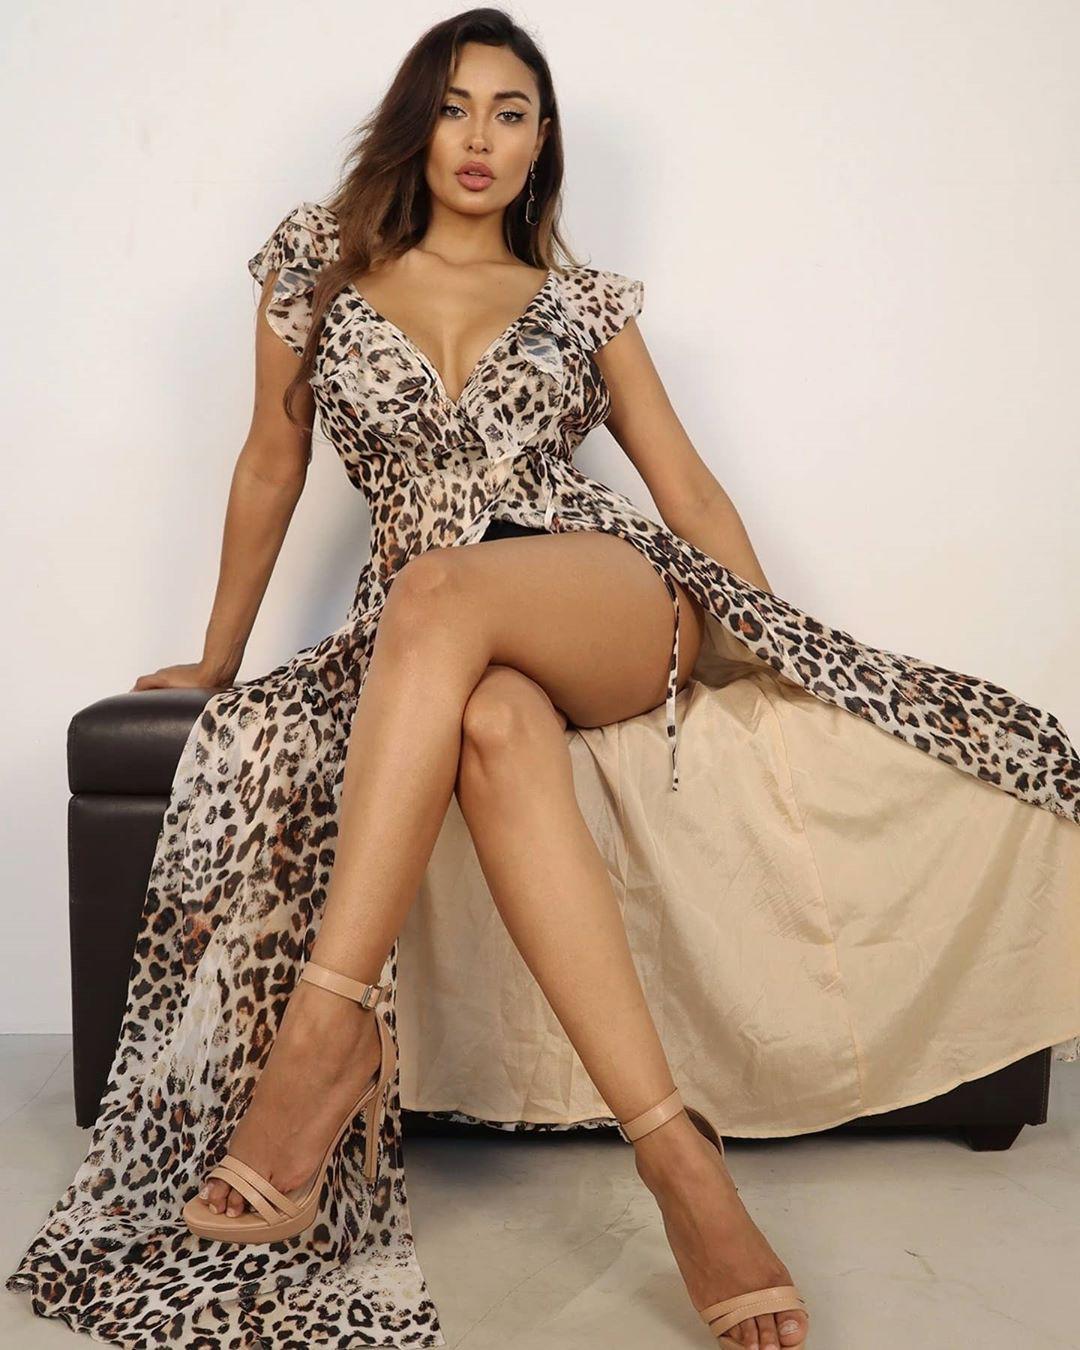 Marona Tanner dress clothing ideas, girls photoshoot, female thighs